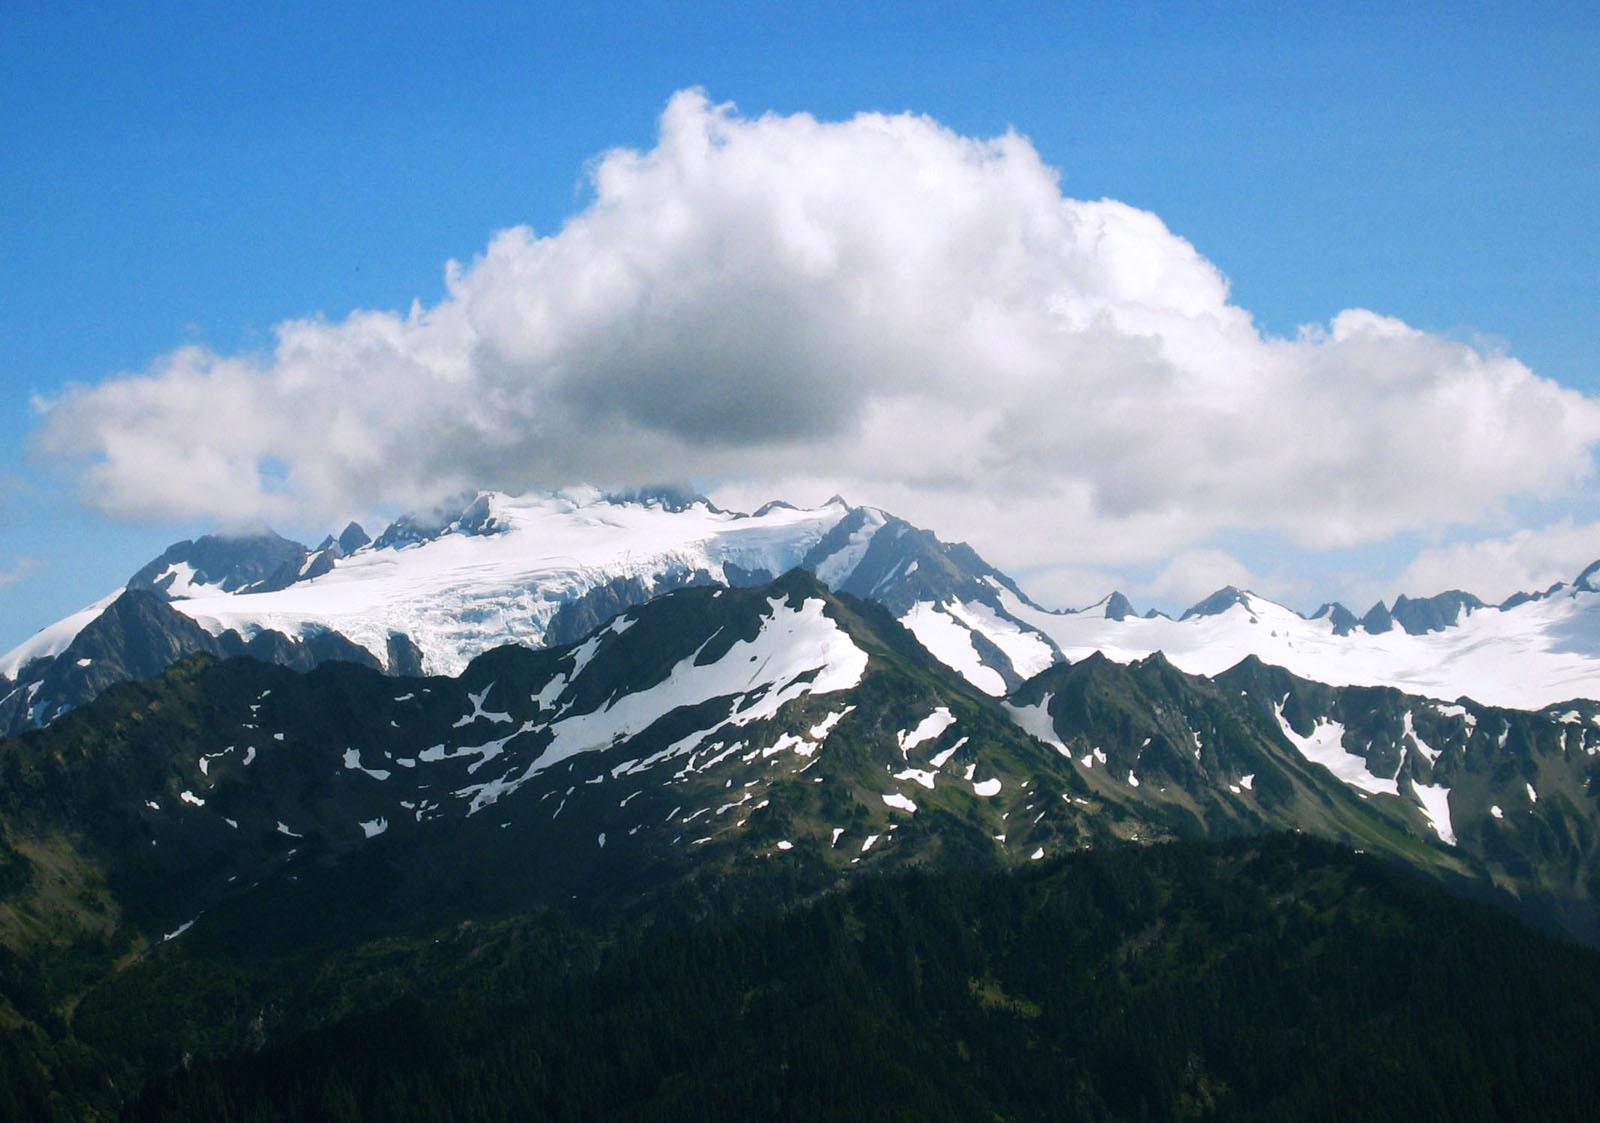 Mount Olympus   Wallpaper 31828 1600x1123